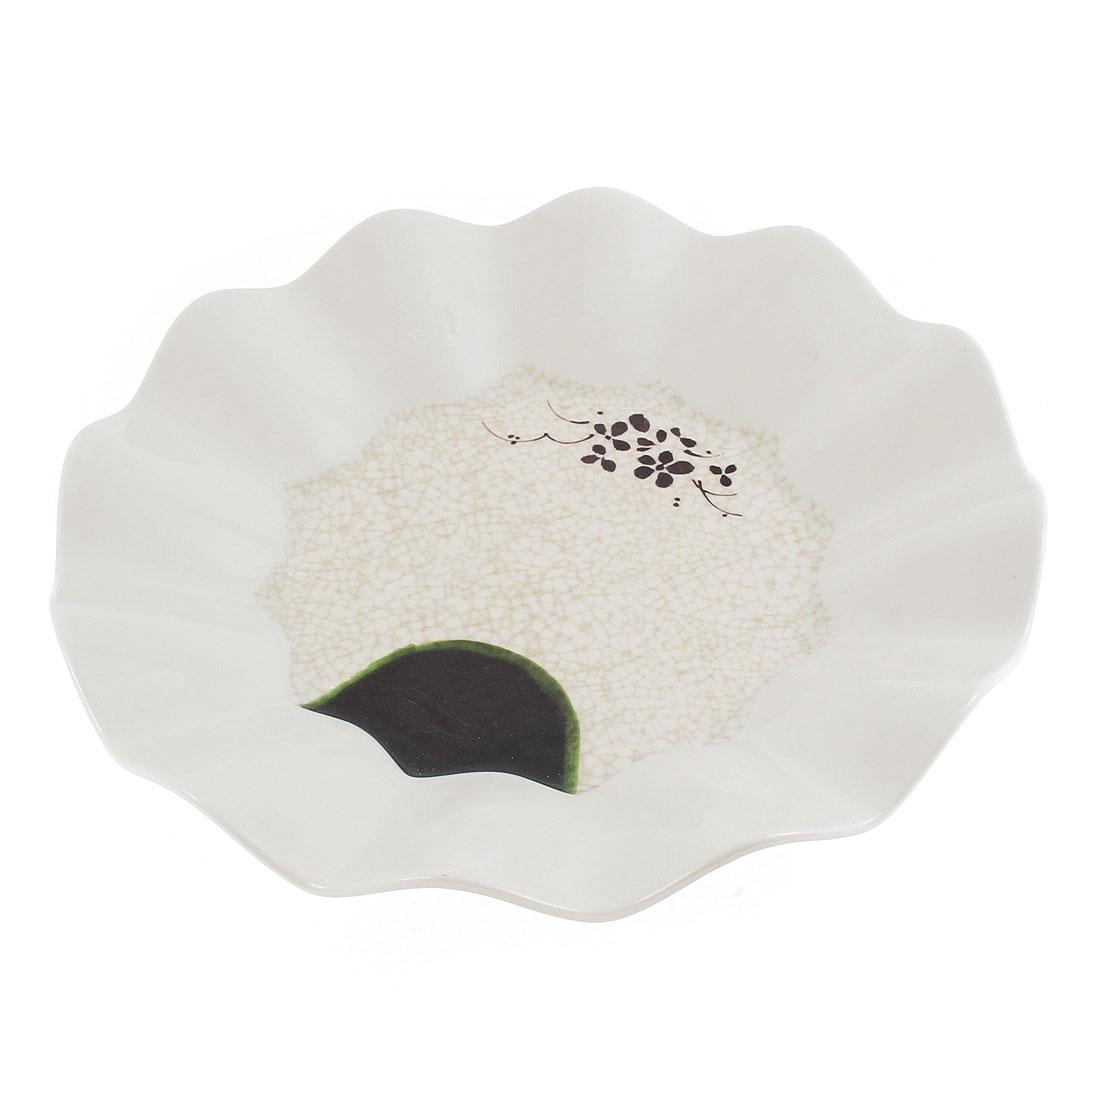 "Plastic Lotus Pattern Wavy Edge Round Shape Dessert Salad Plate 10.5"" Dia"